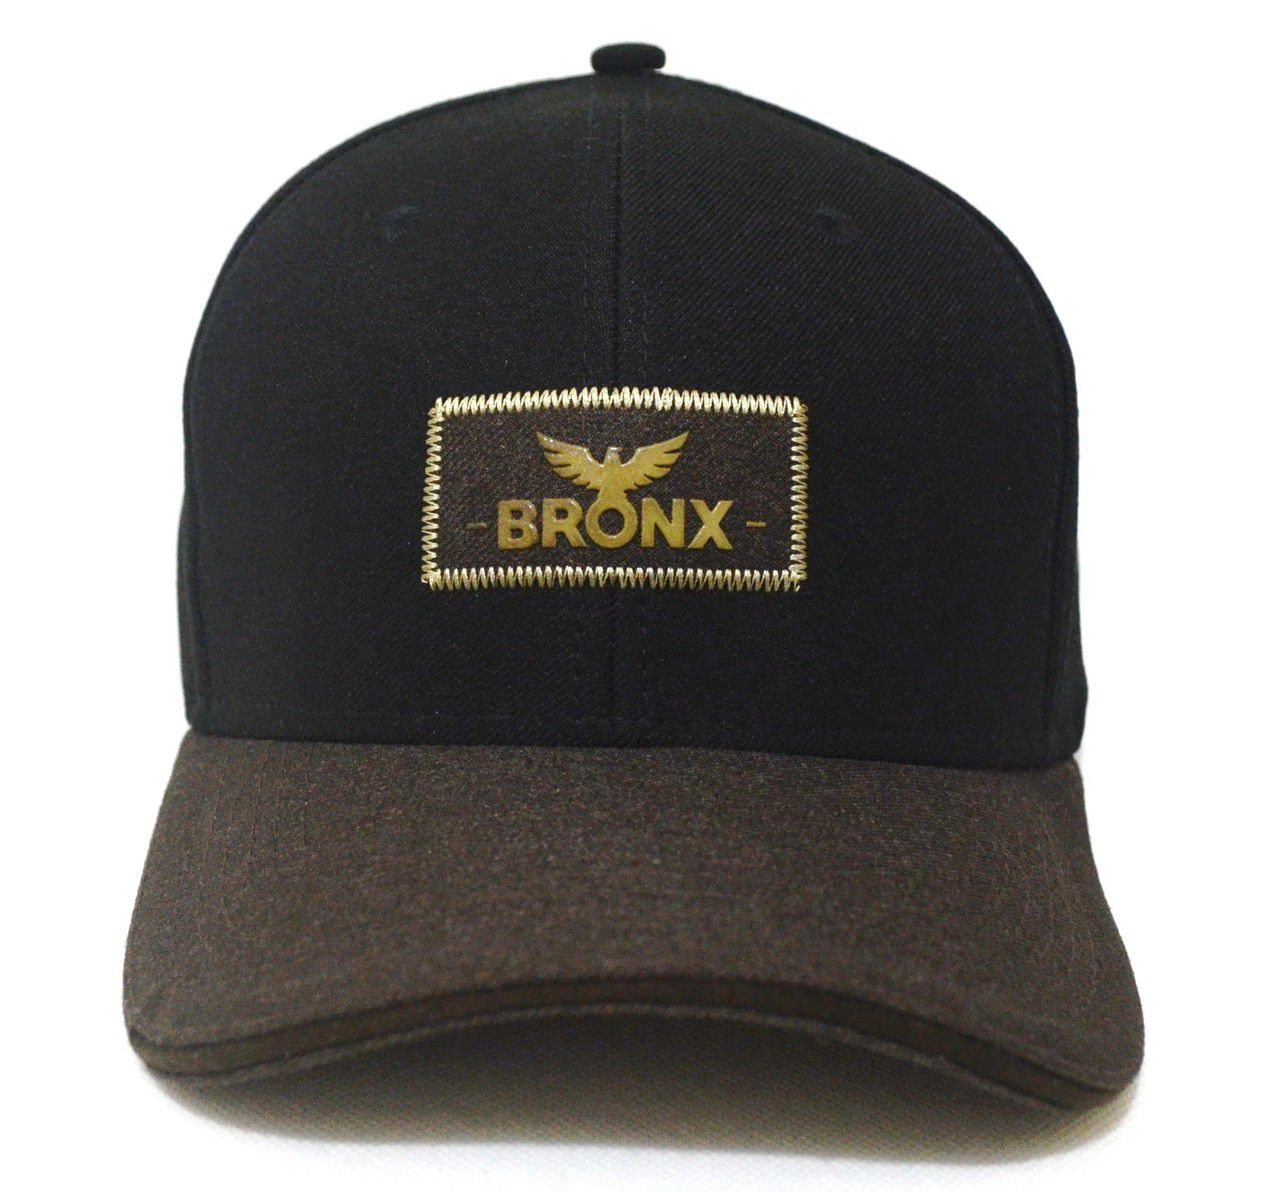 Boné Bronx Aba Curva Duas Cores Casual Snapback